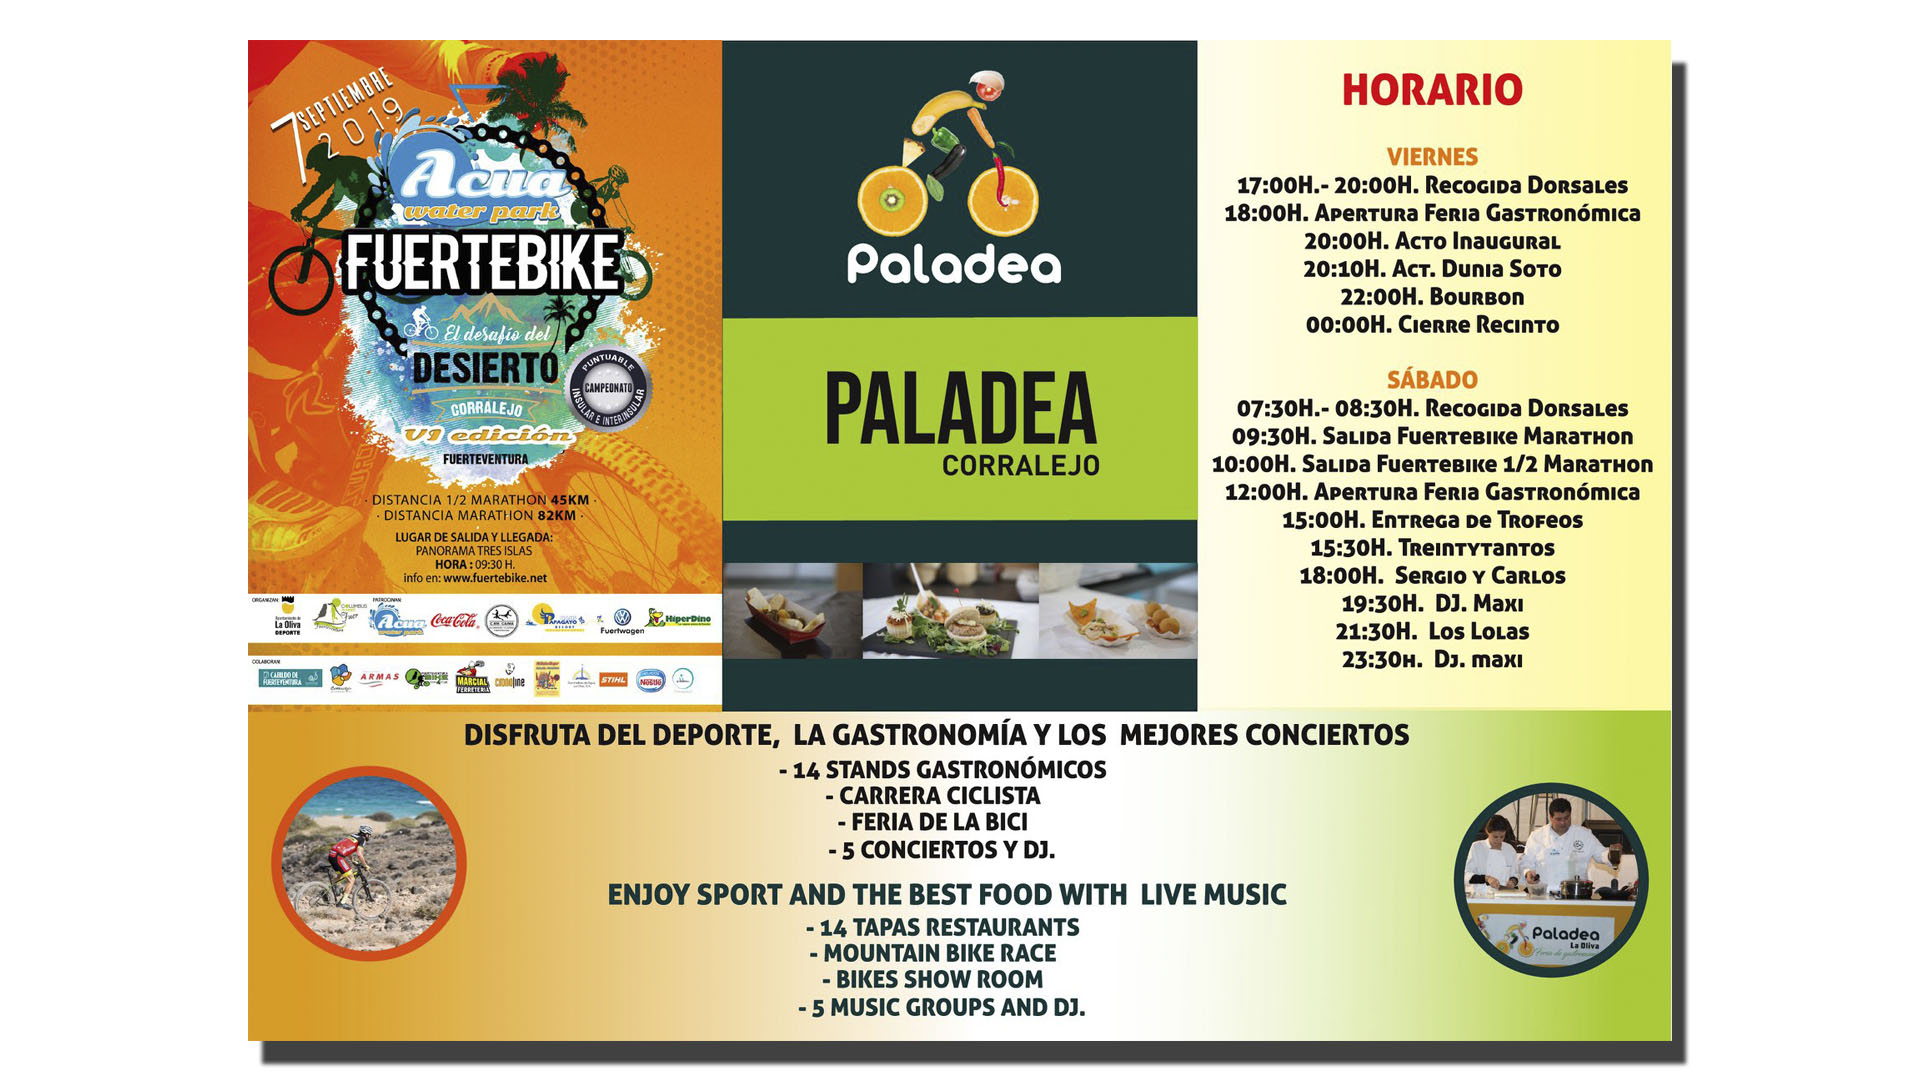 Programm Fuertebike 2019 Corralejo Fuerteventura.